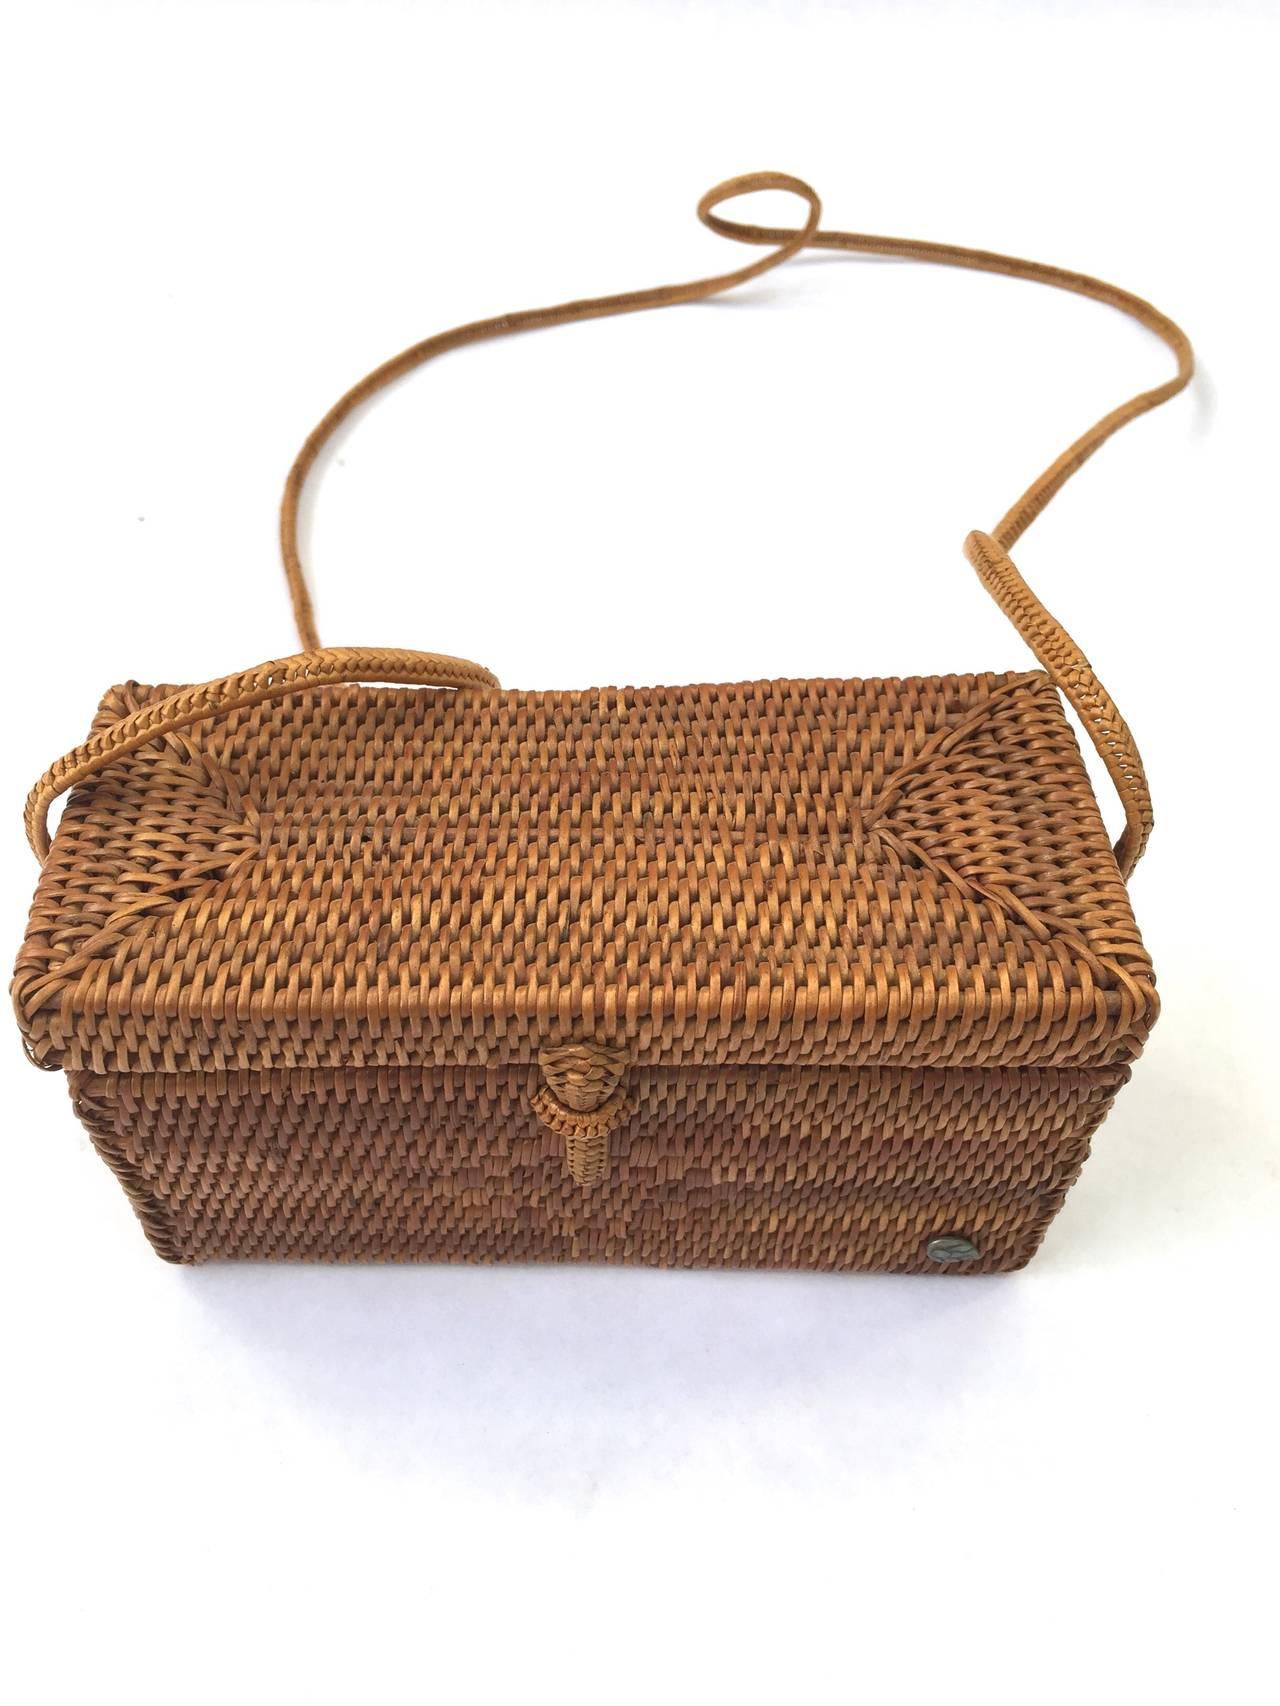 Helen Kaminski woven raffia square shoulder bag. at 1stdibs